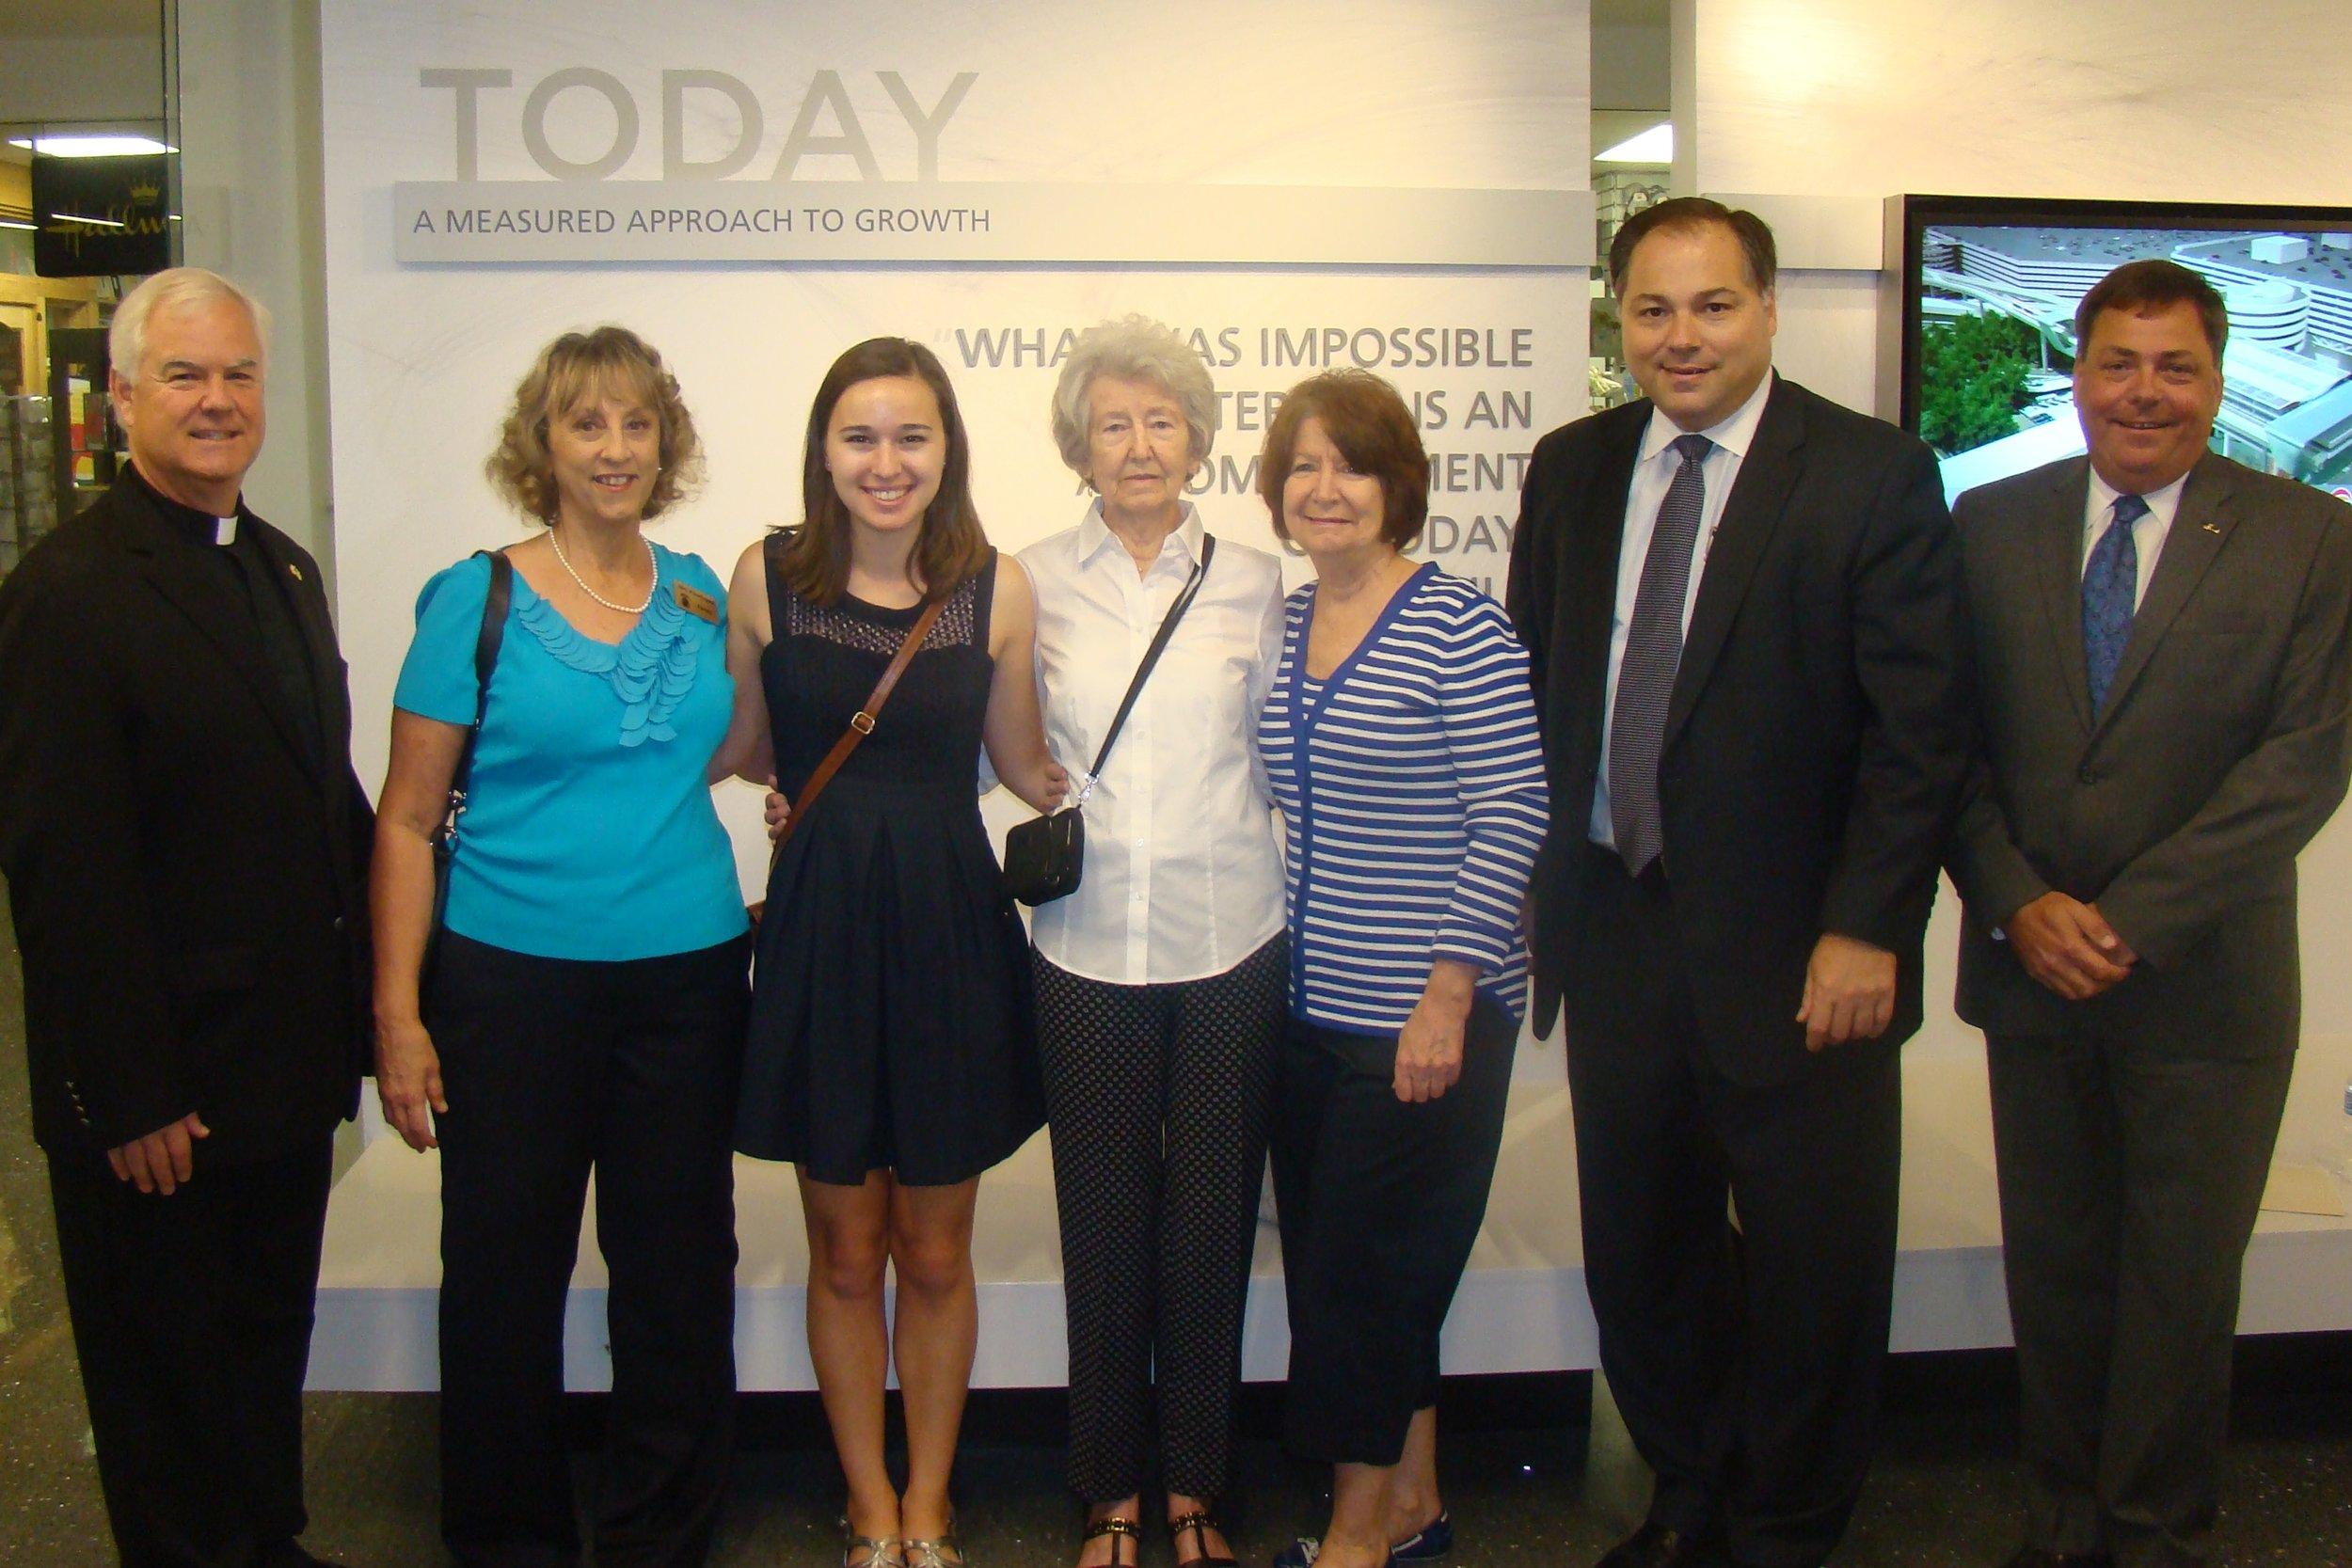 Brooke Papa, Essay Contest Winner, Family, et al - 3, 30 Oct '14.JPG